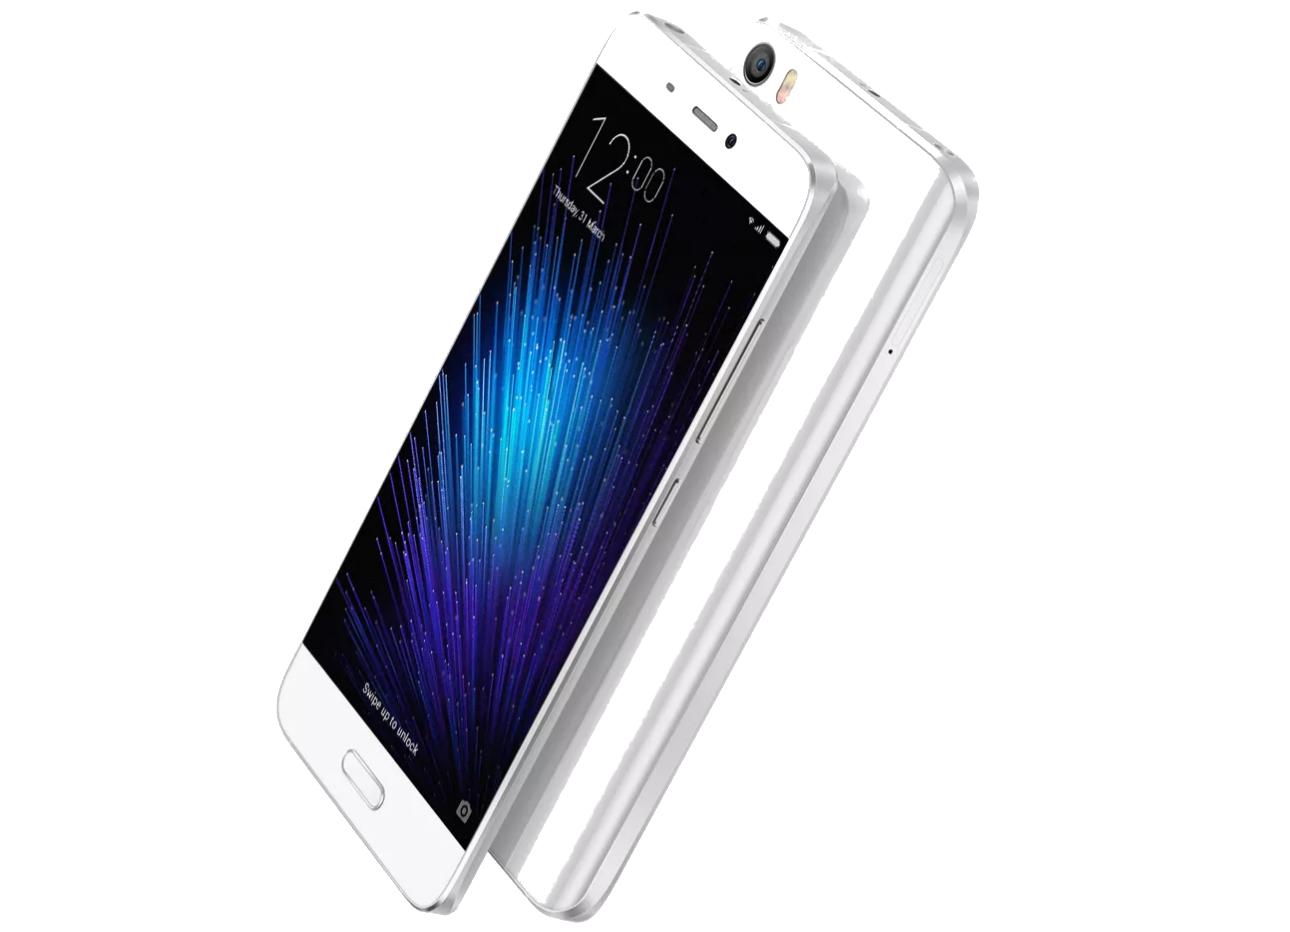 Xiaomi Mi 5 Smartphone Review Reviews Redmi Note Pro Ram 6gb Rom 64gb New Original In Sample Courtesy Of Tradingshenzen